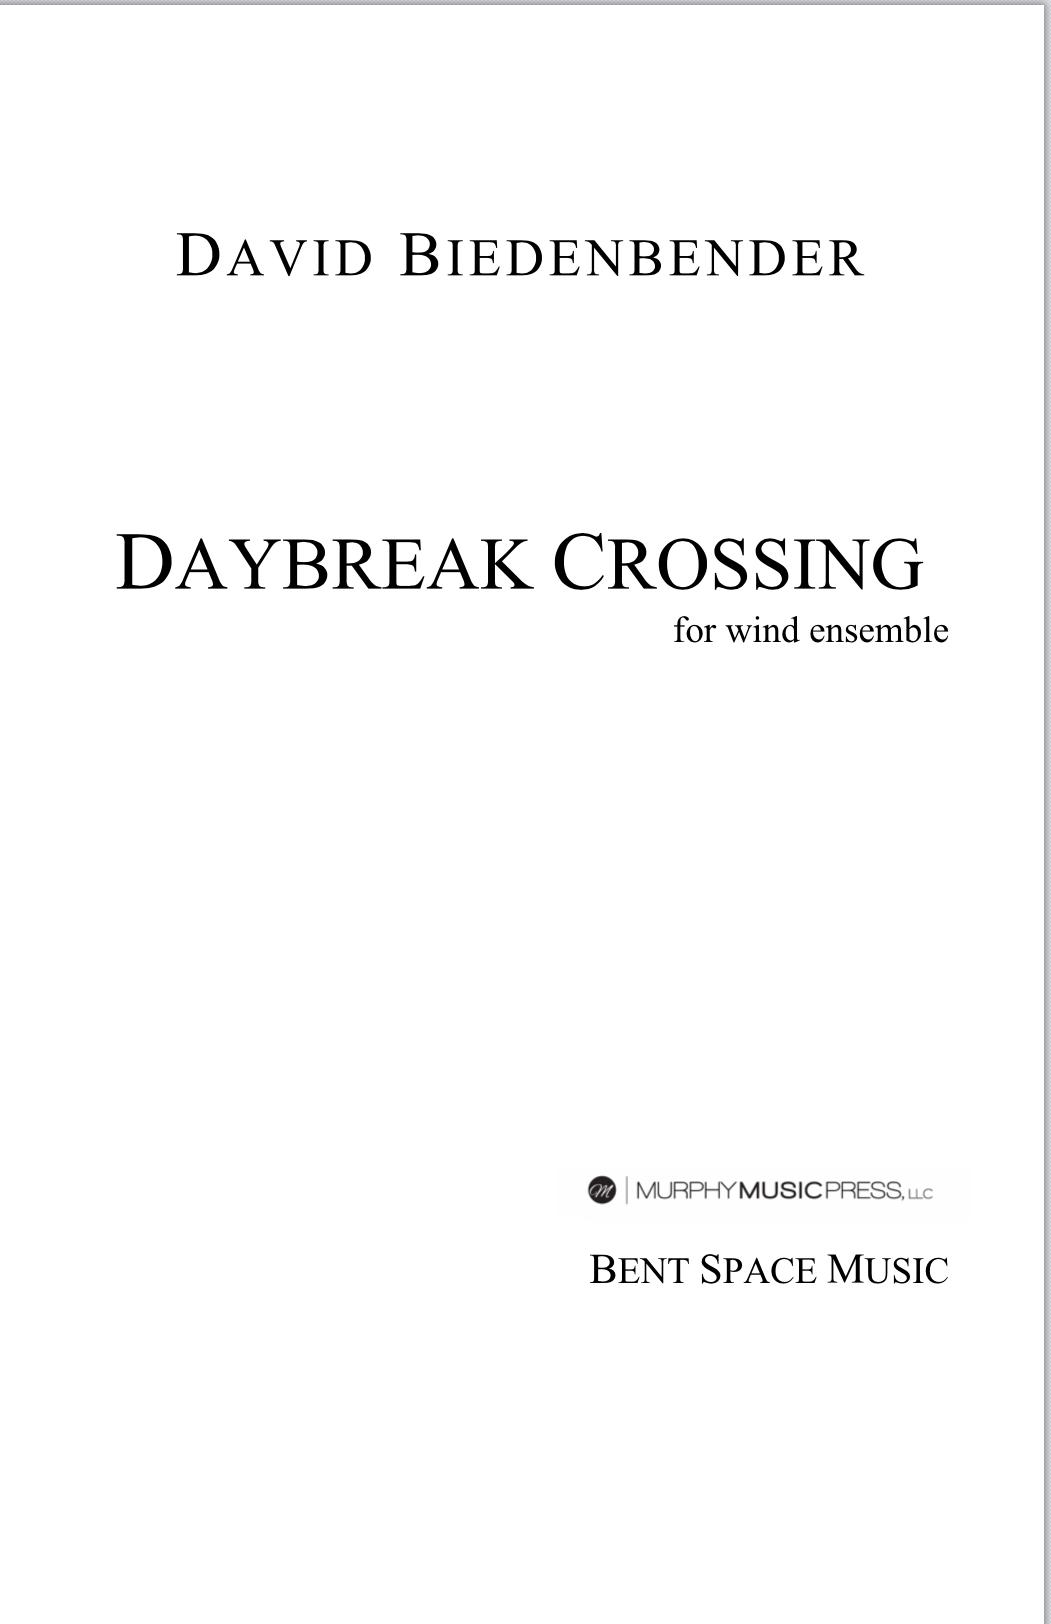 Daybreak Crossing by David Biedenbender